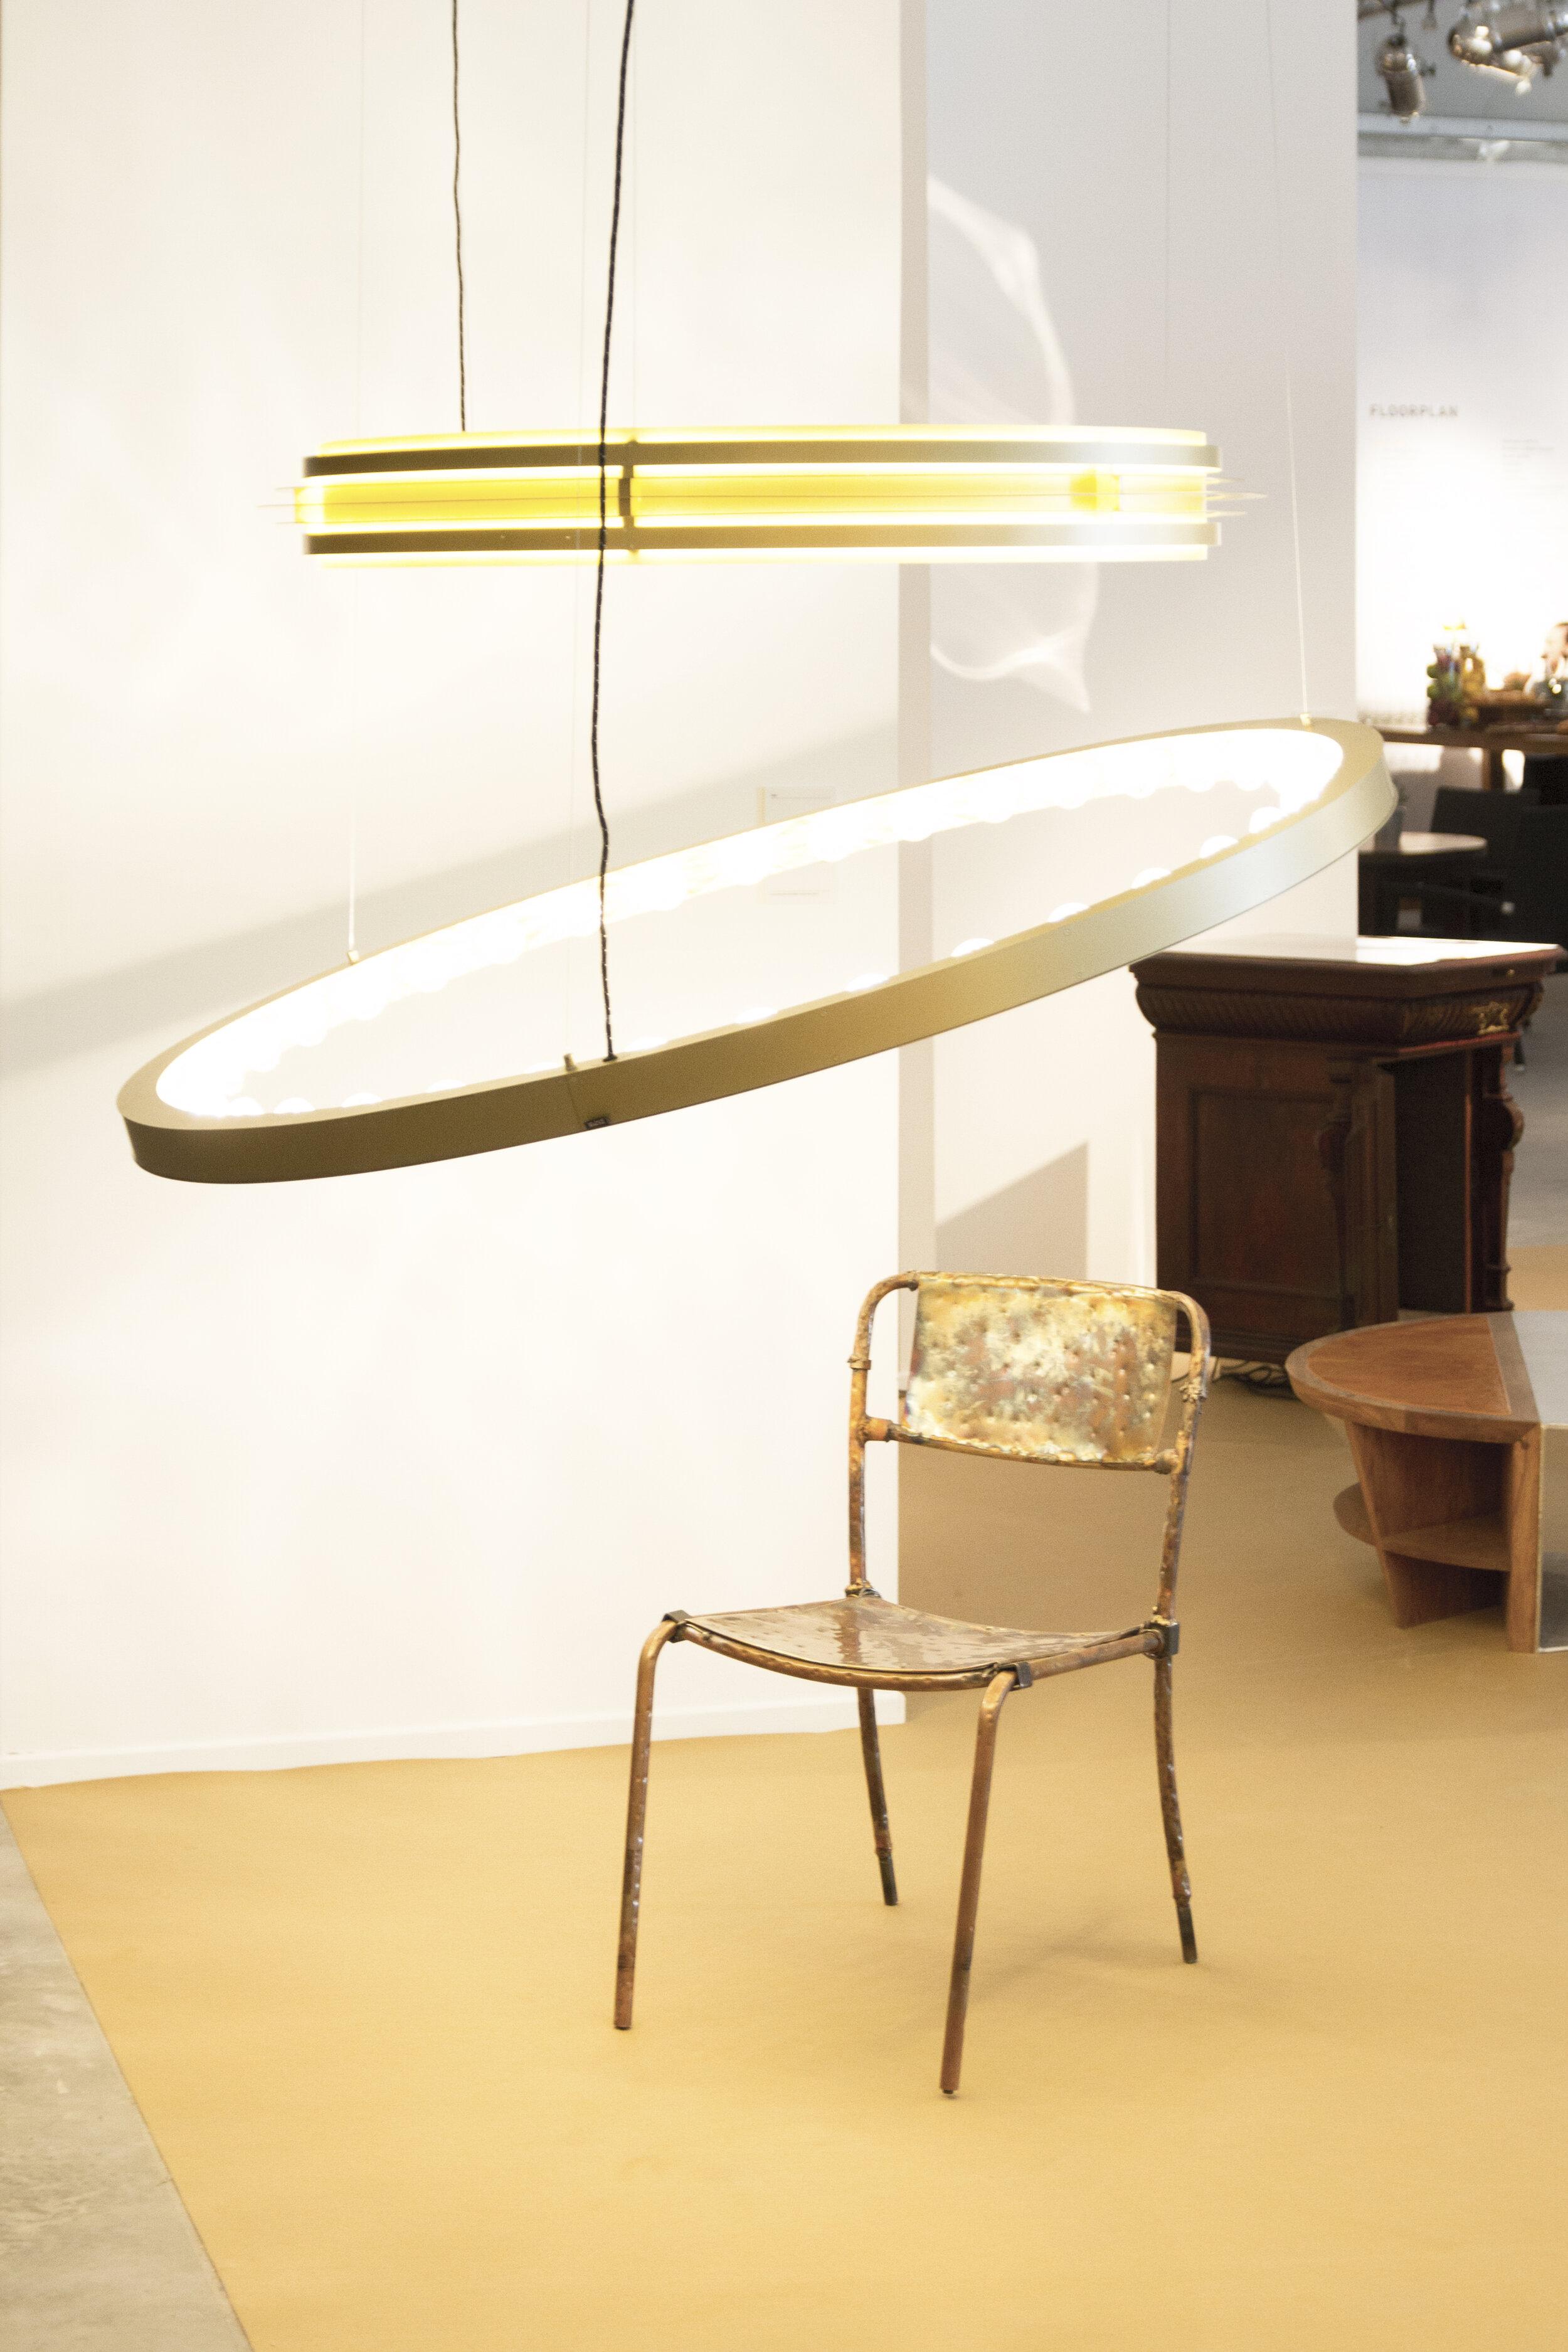 Light by JSPR / Chair by Niek van der Heijden